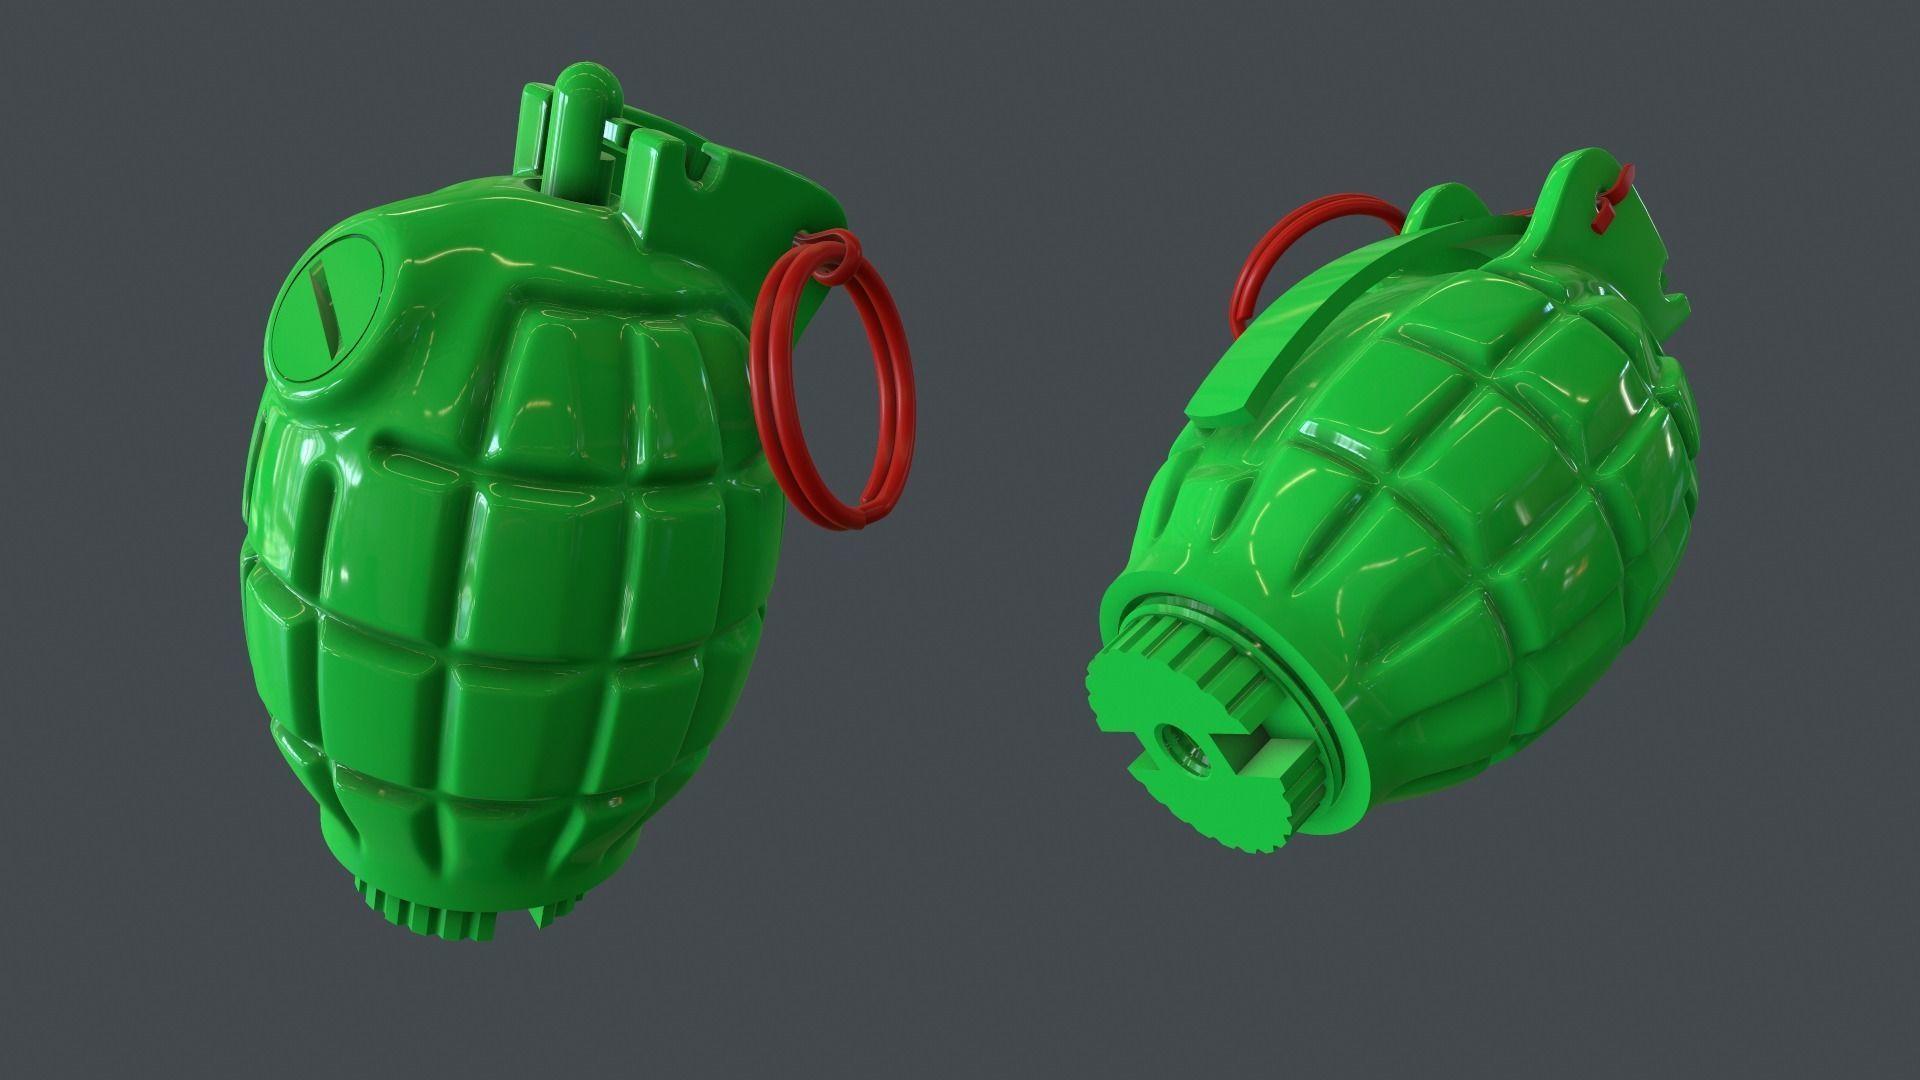 Mills bomb No 36M grenade